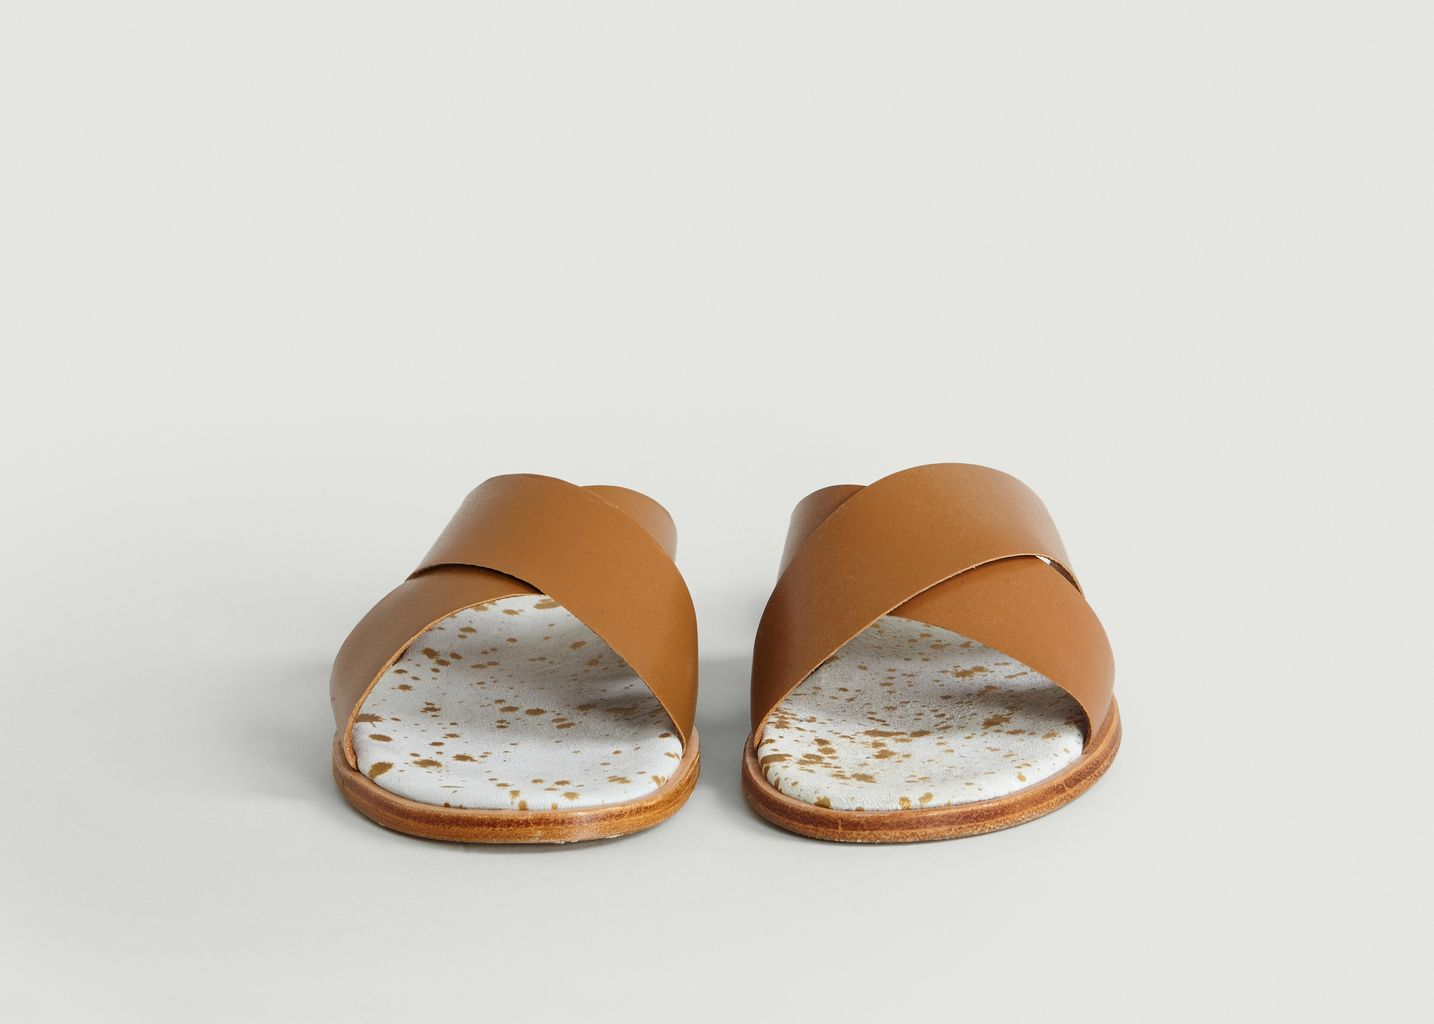 Sandales Cuir Croisées Infinity - Craie dHCCZV2